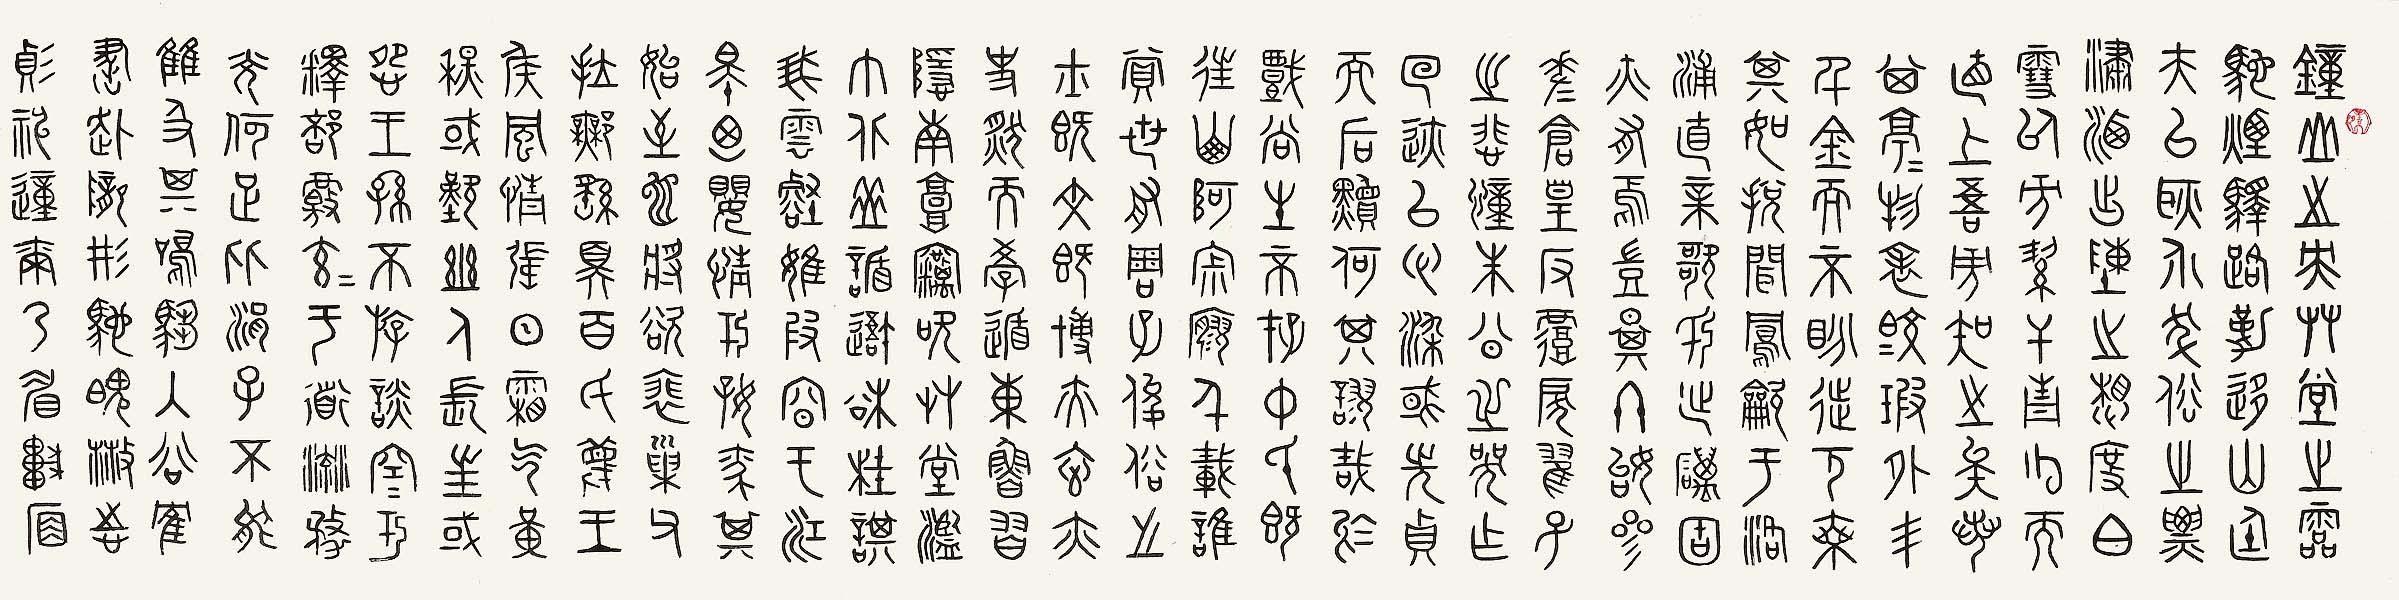 Seal Script Calligraphy